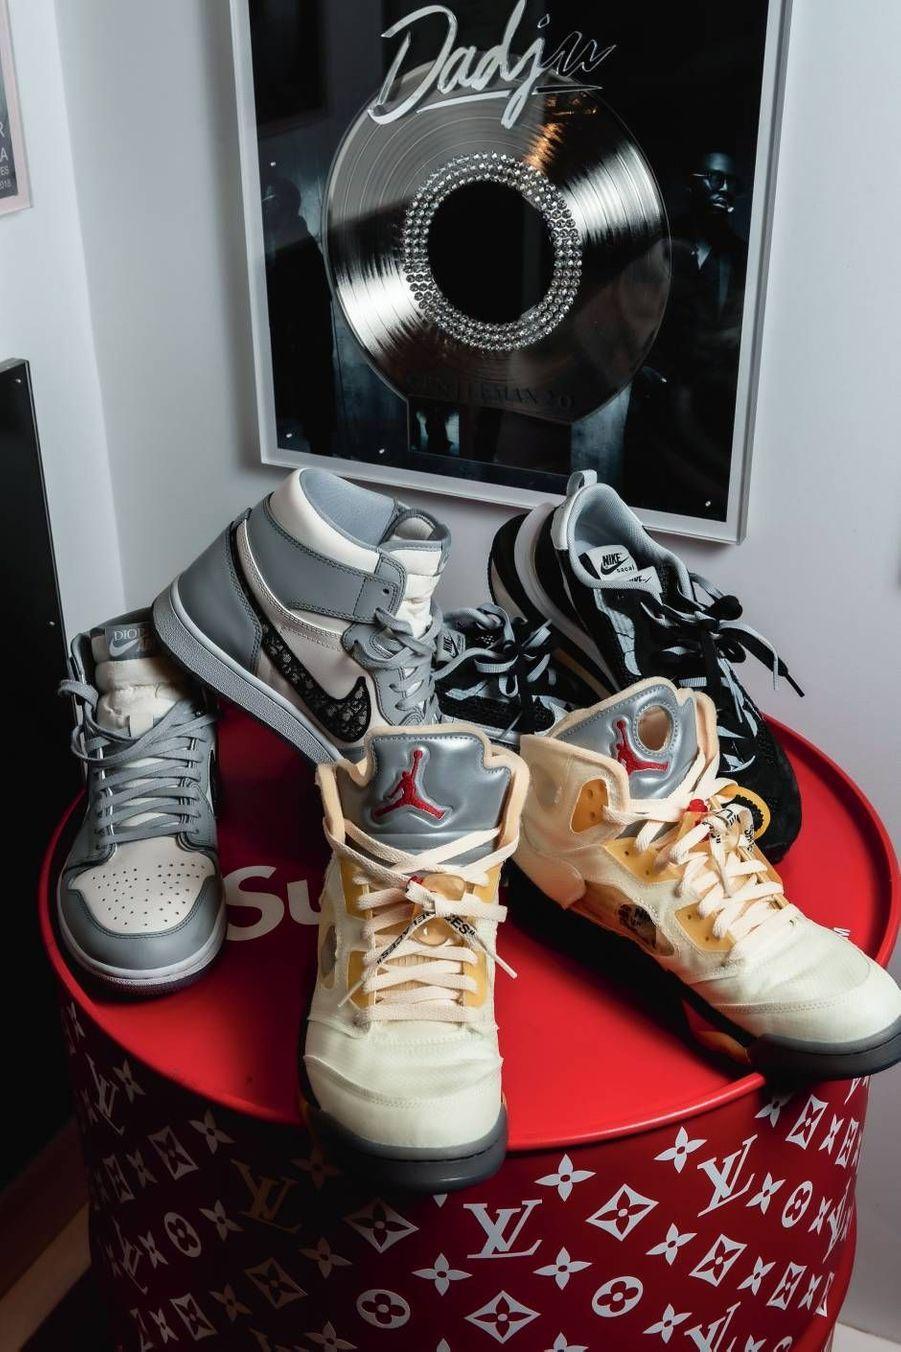 Air Jordan 1 Dior, Off-White x Air Jordan 5 Retro Sail, Nike Vaporwaffle Sacai... Sneakers addict, Dadju possède tous les modèles collectors du moment.